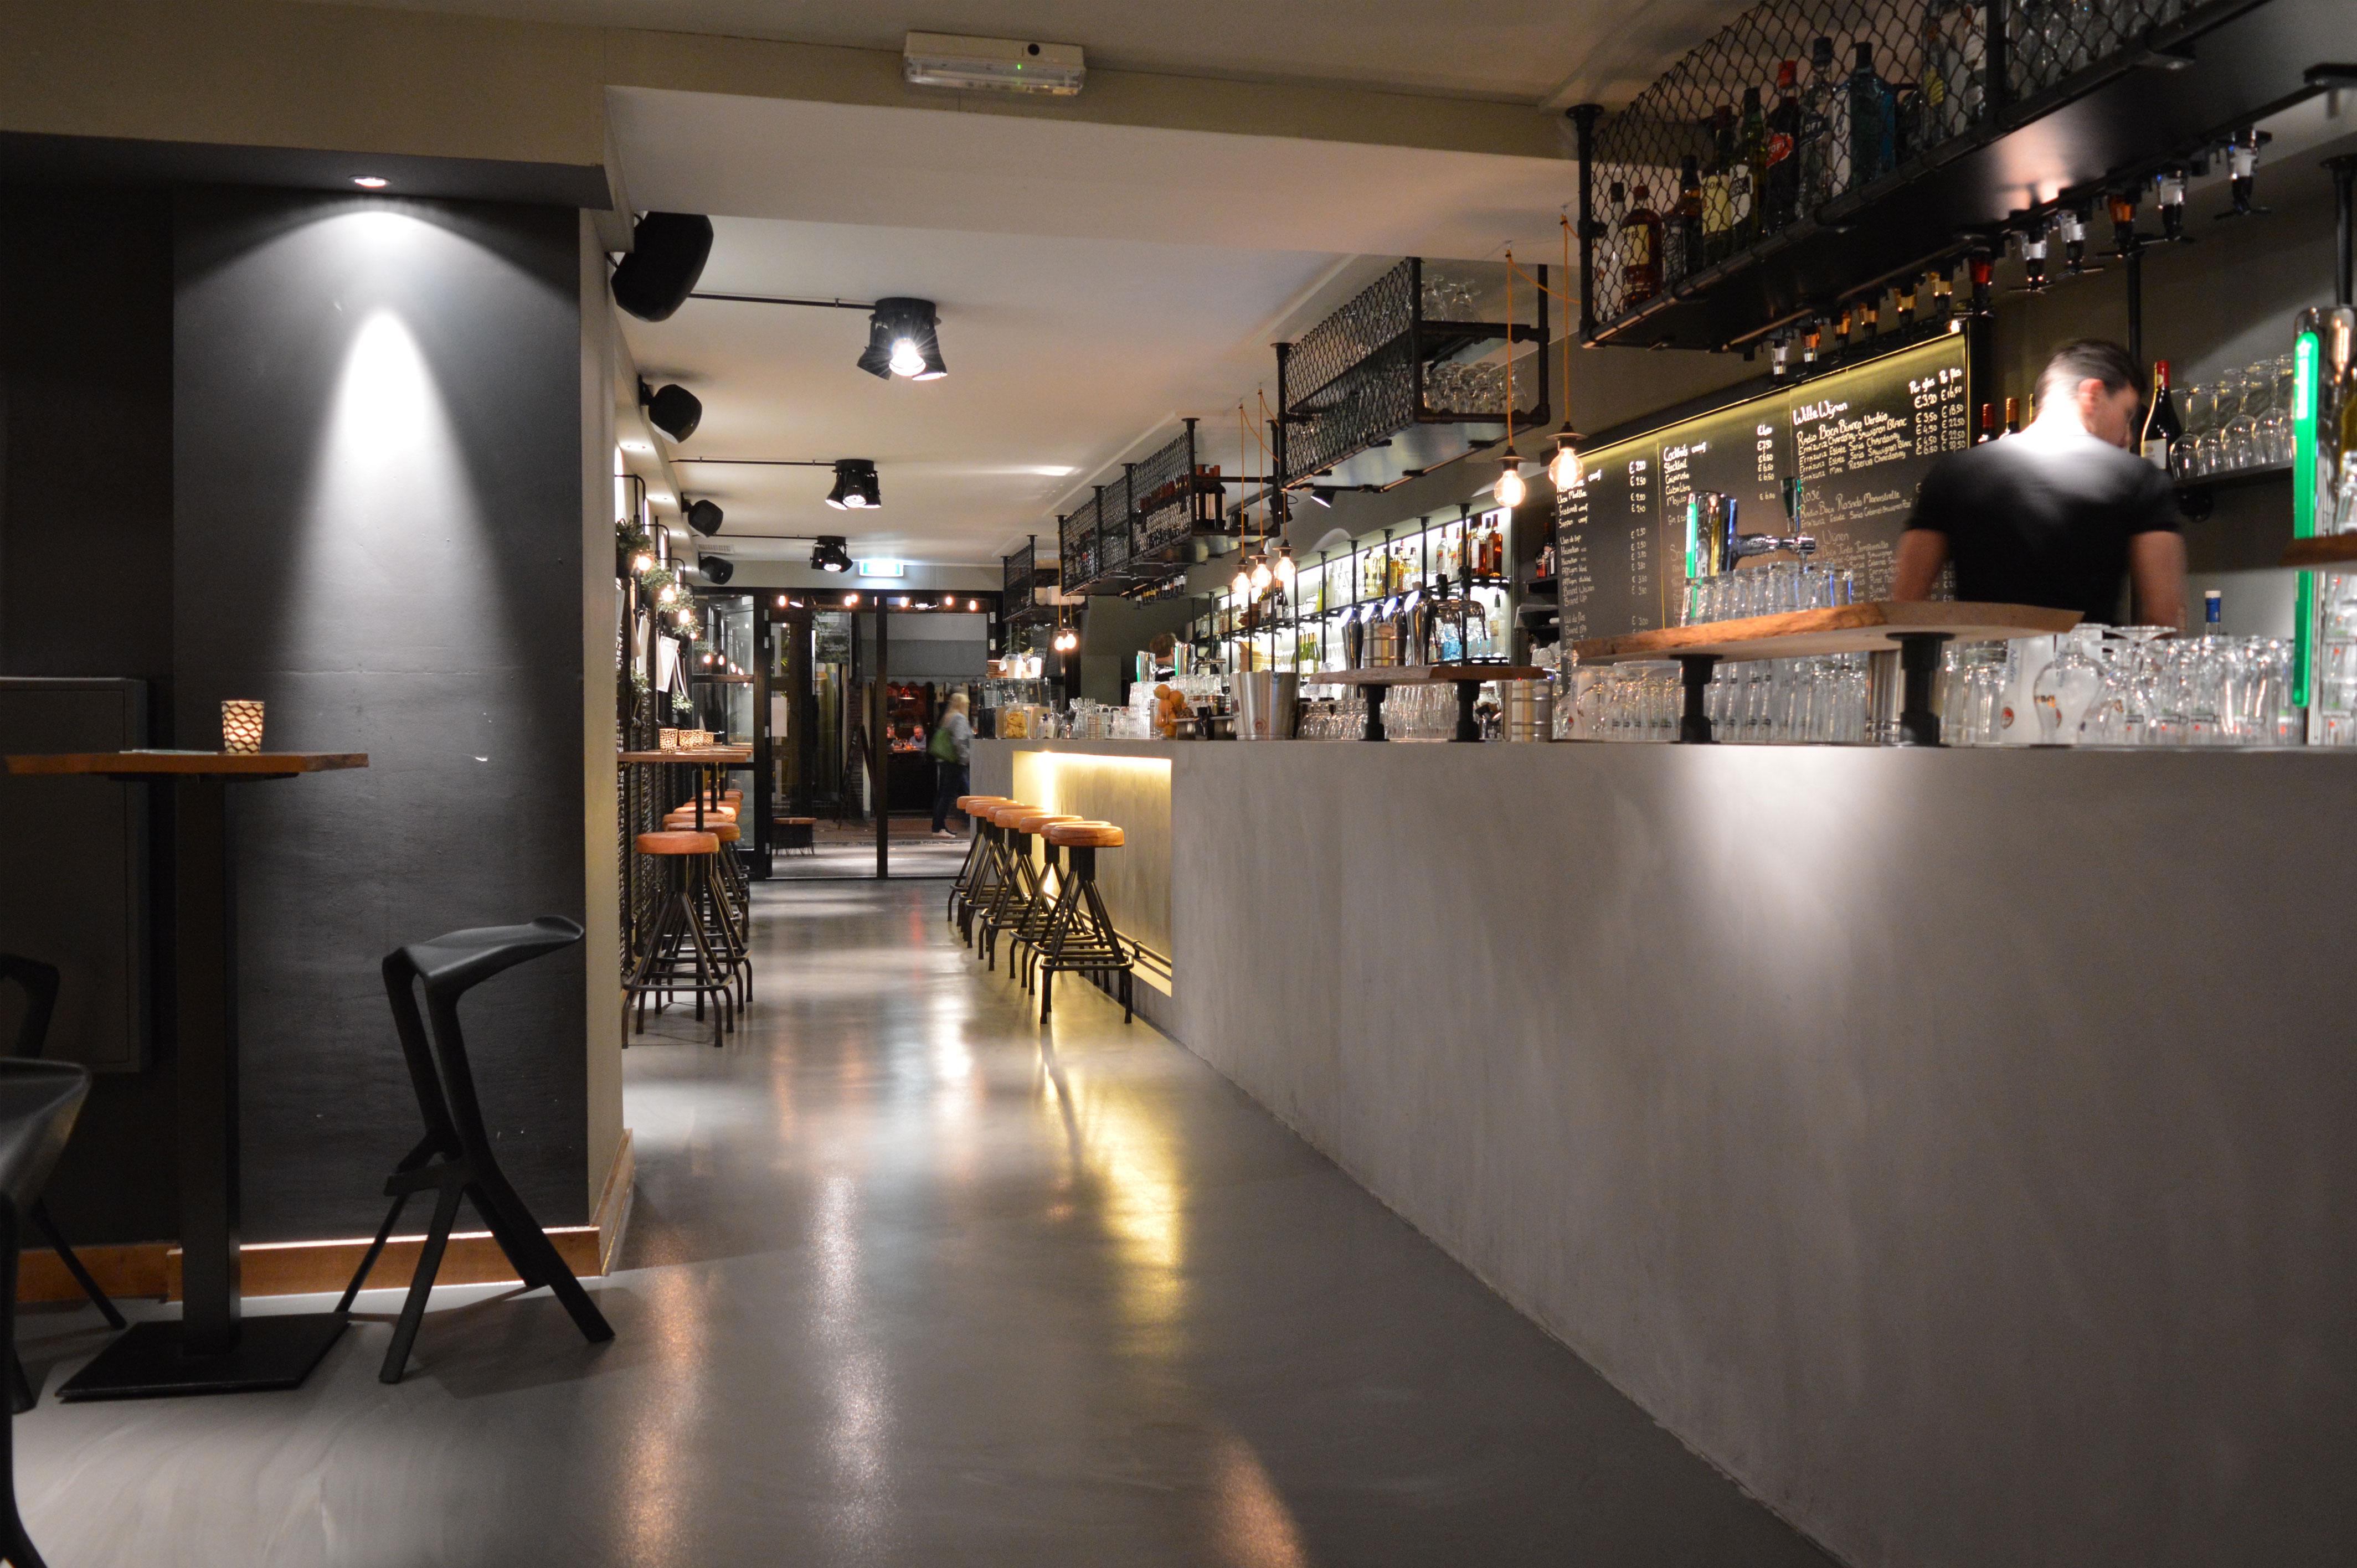 bar betonlook, interieur muziekcafé STECK Delft, KREUK architectuur, architect Marjolein Kreuk